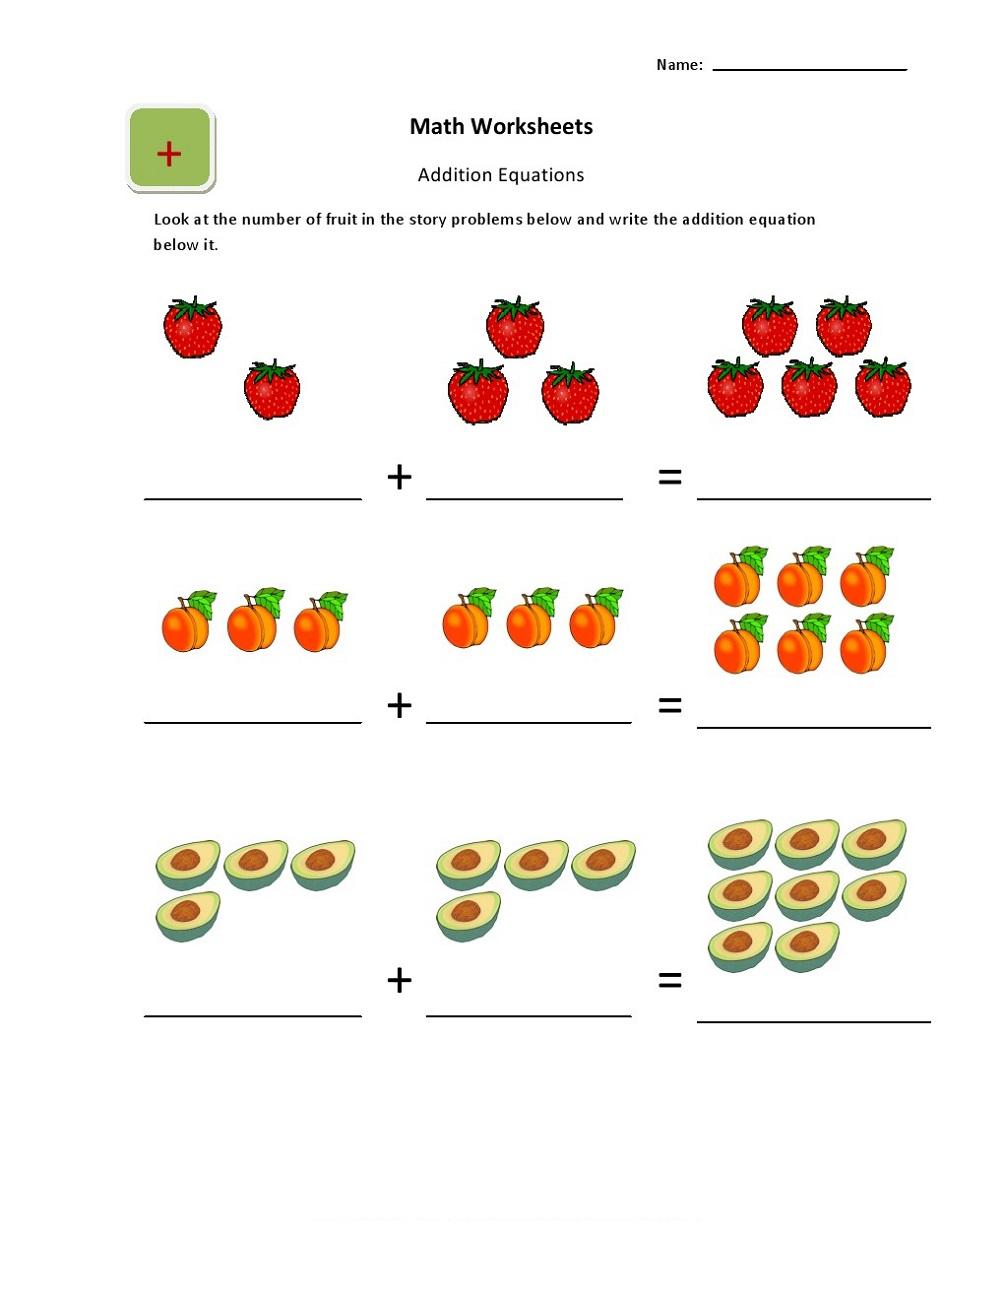 Ukg Worksheets Kids Learning Printable